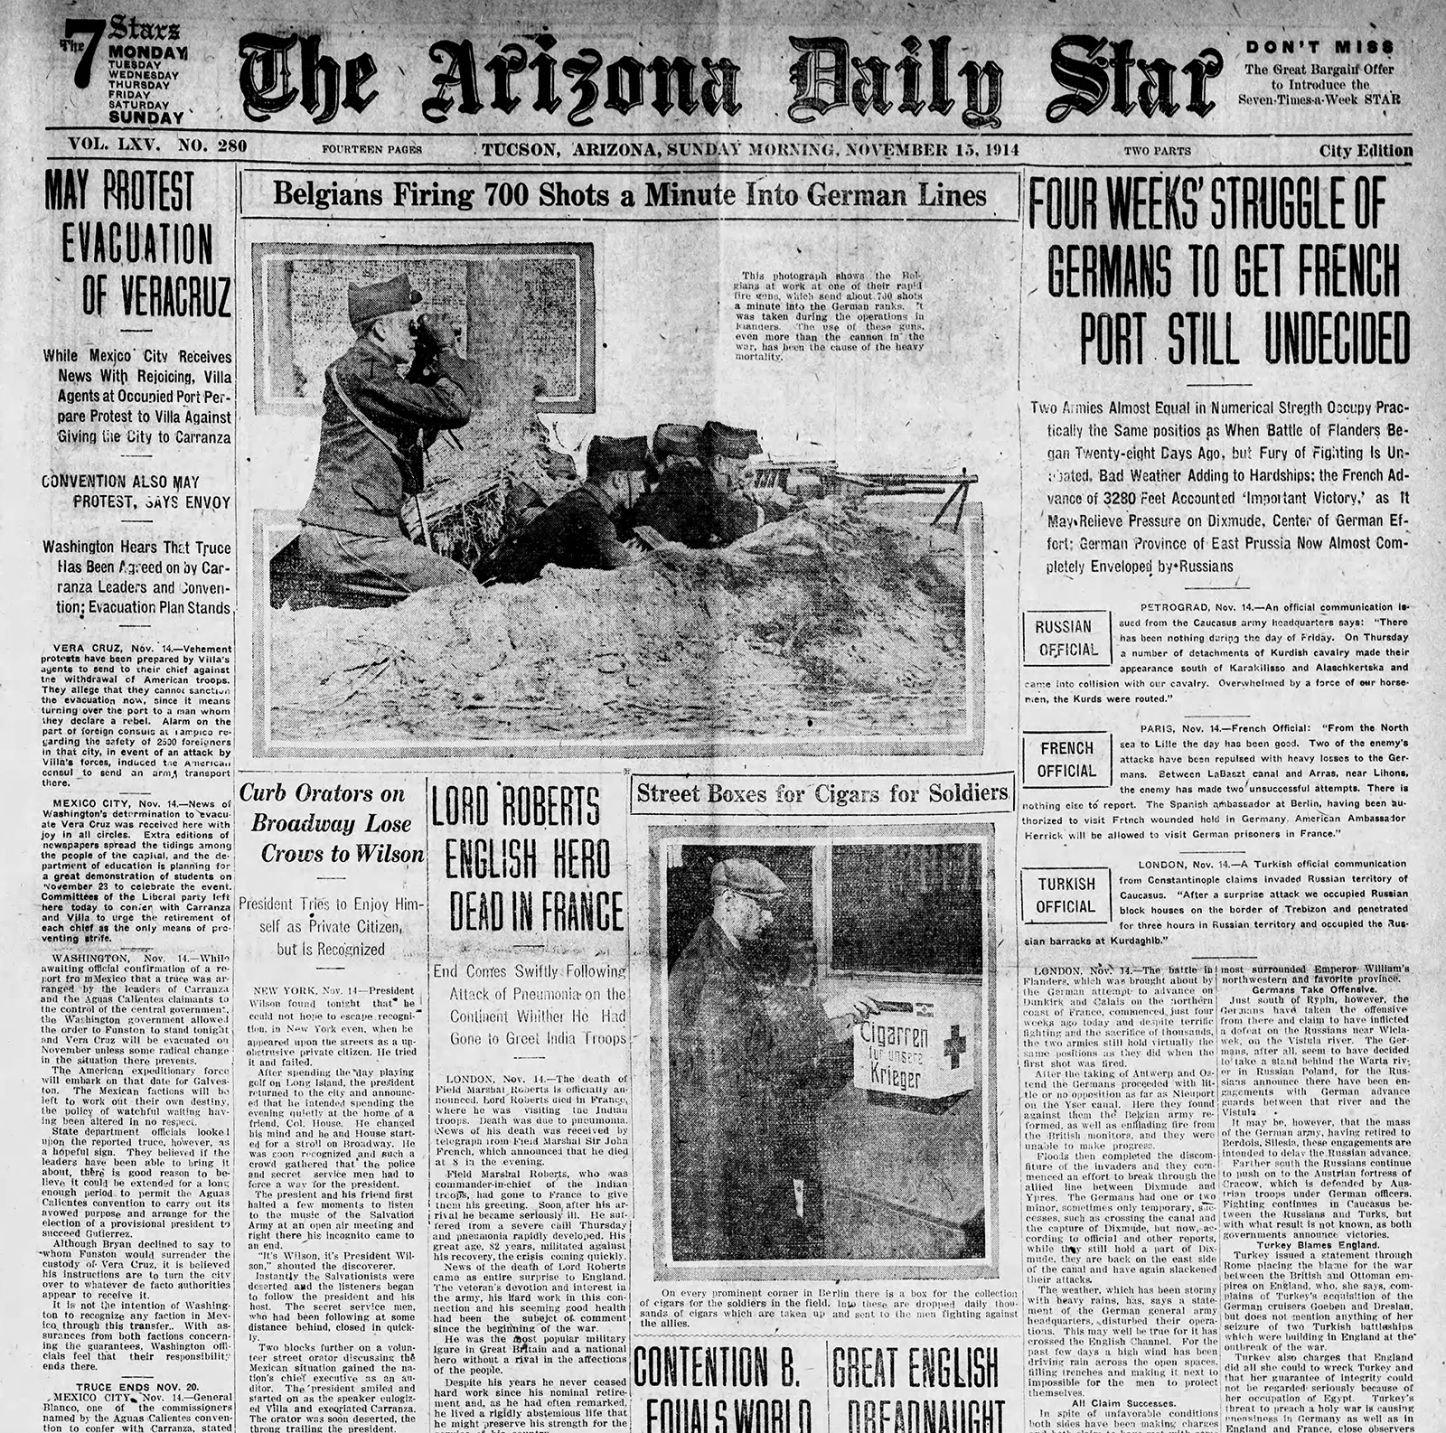 Nov  15 Arizona Daily Star front pages: Apollo 12 takes off